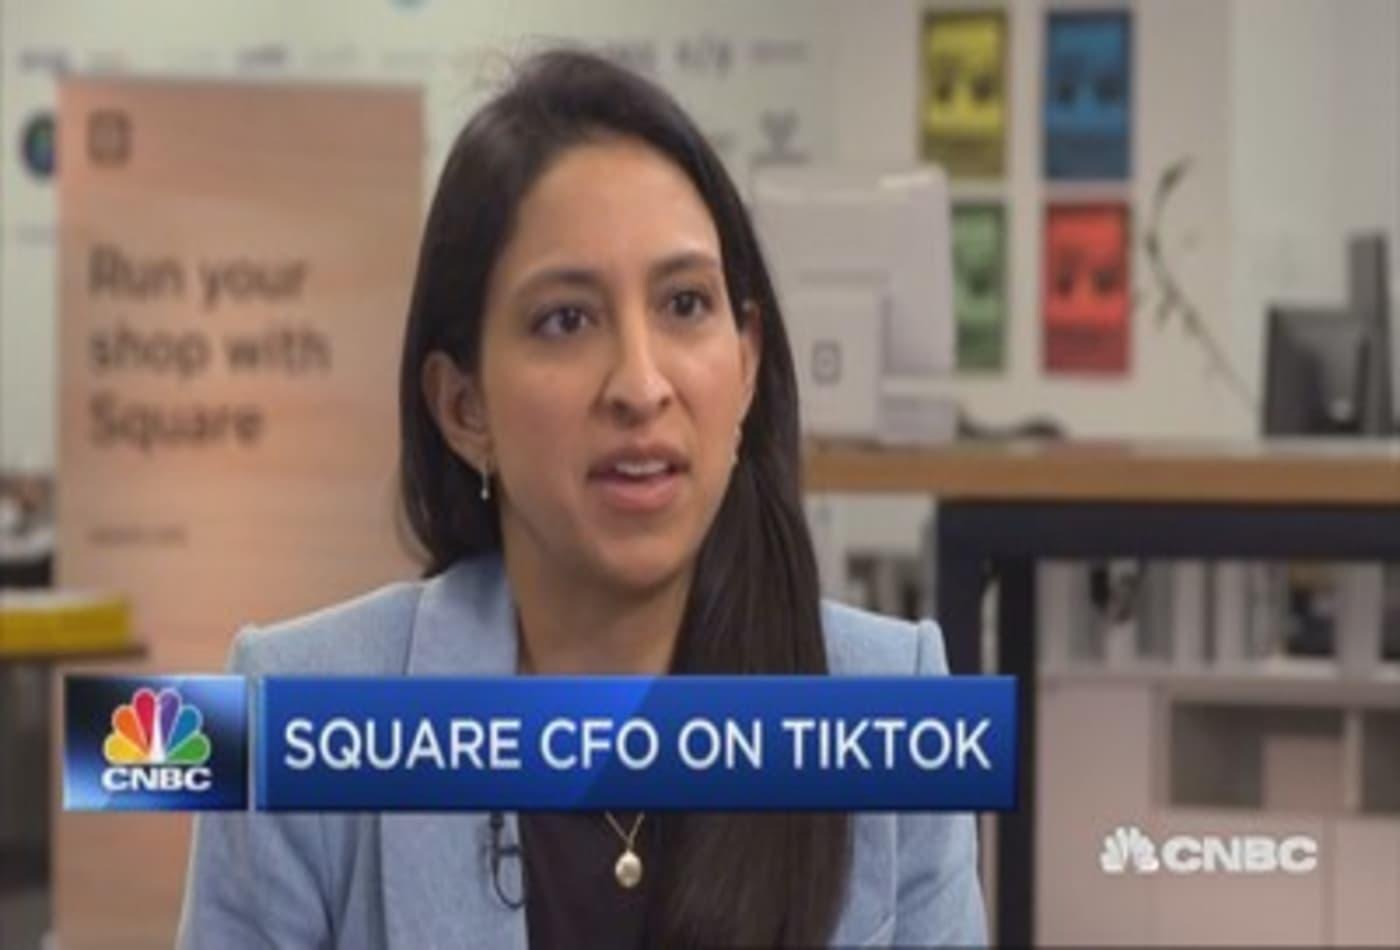 Square CFO on earnings, millennial marketing and coronavirus